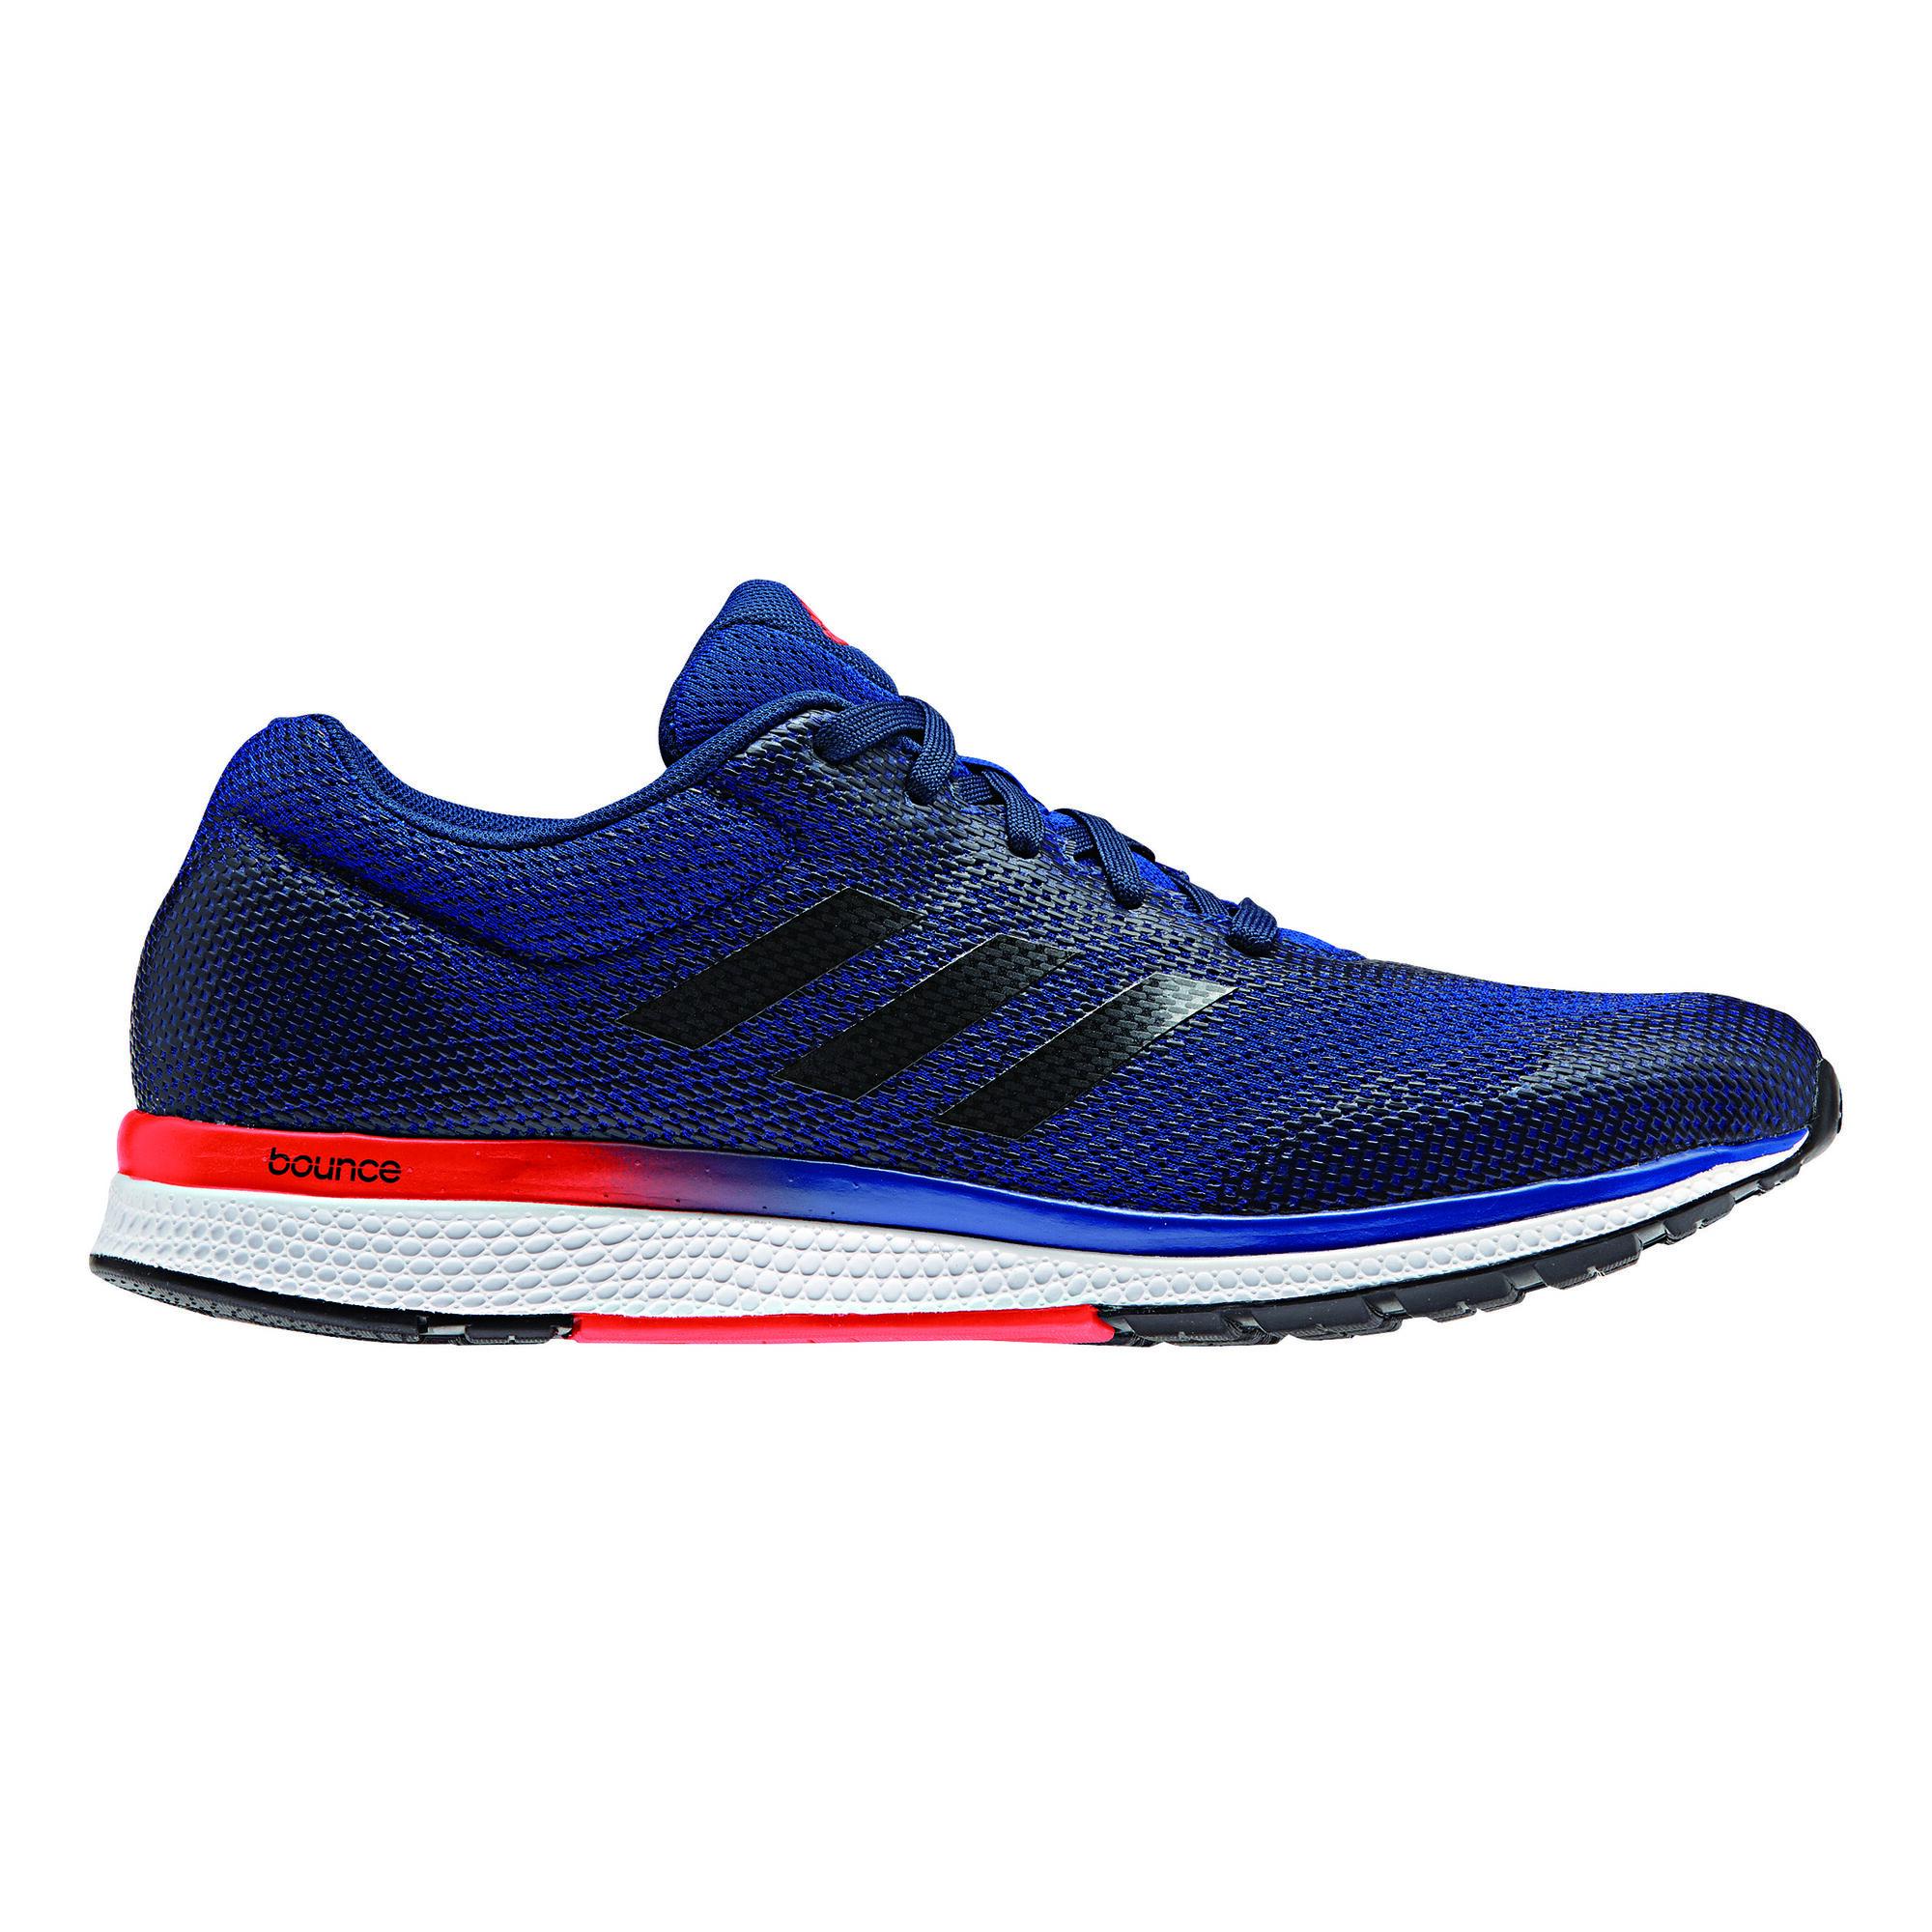 7762929c40dfa buy adidas Mana Bounce 2 Aramis Neutral Running Shoe Men - Dark Blue ...